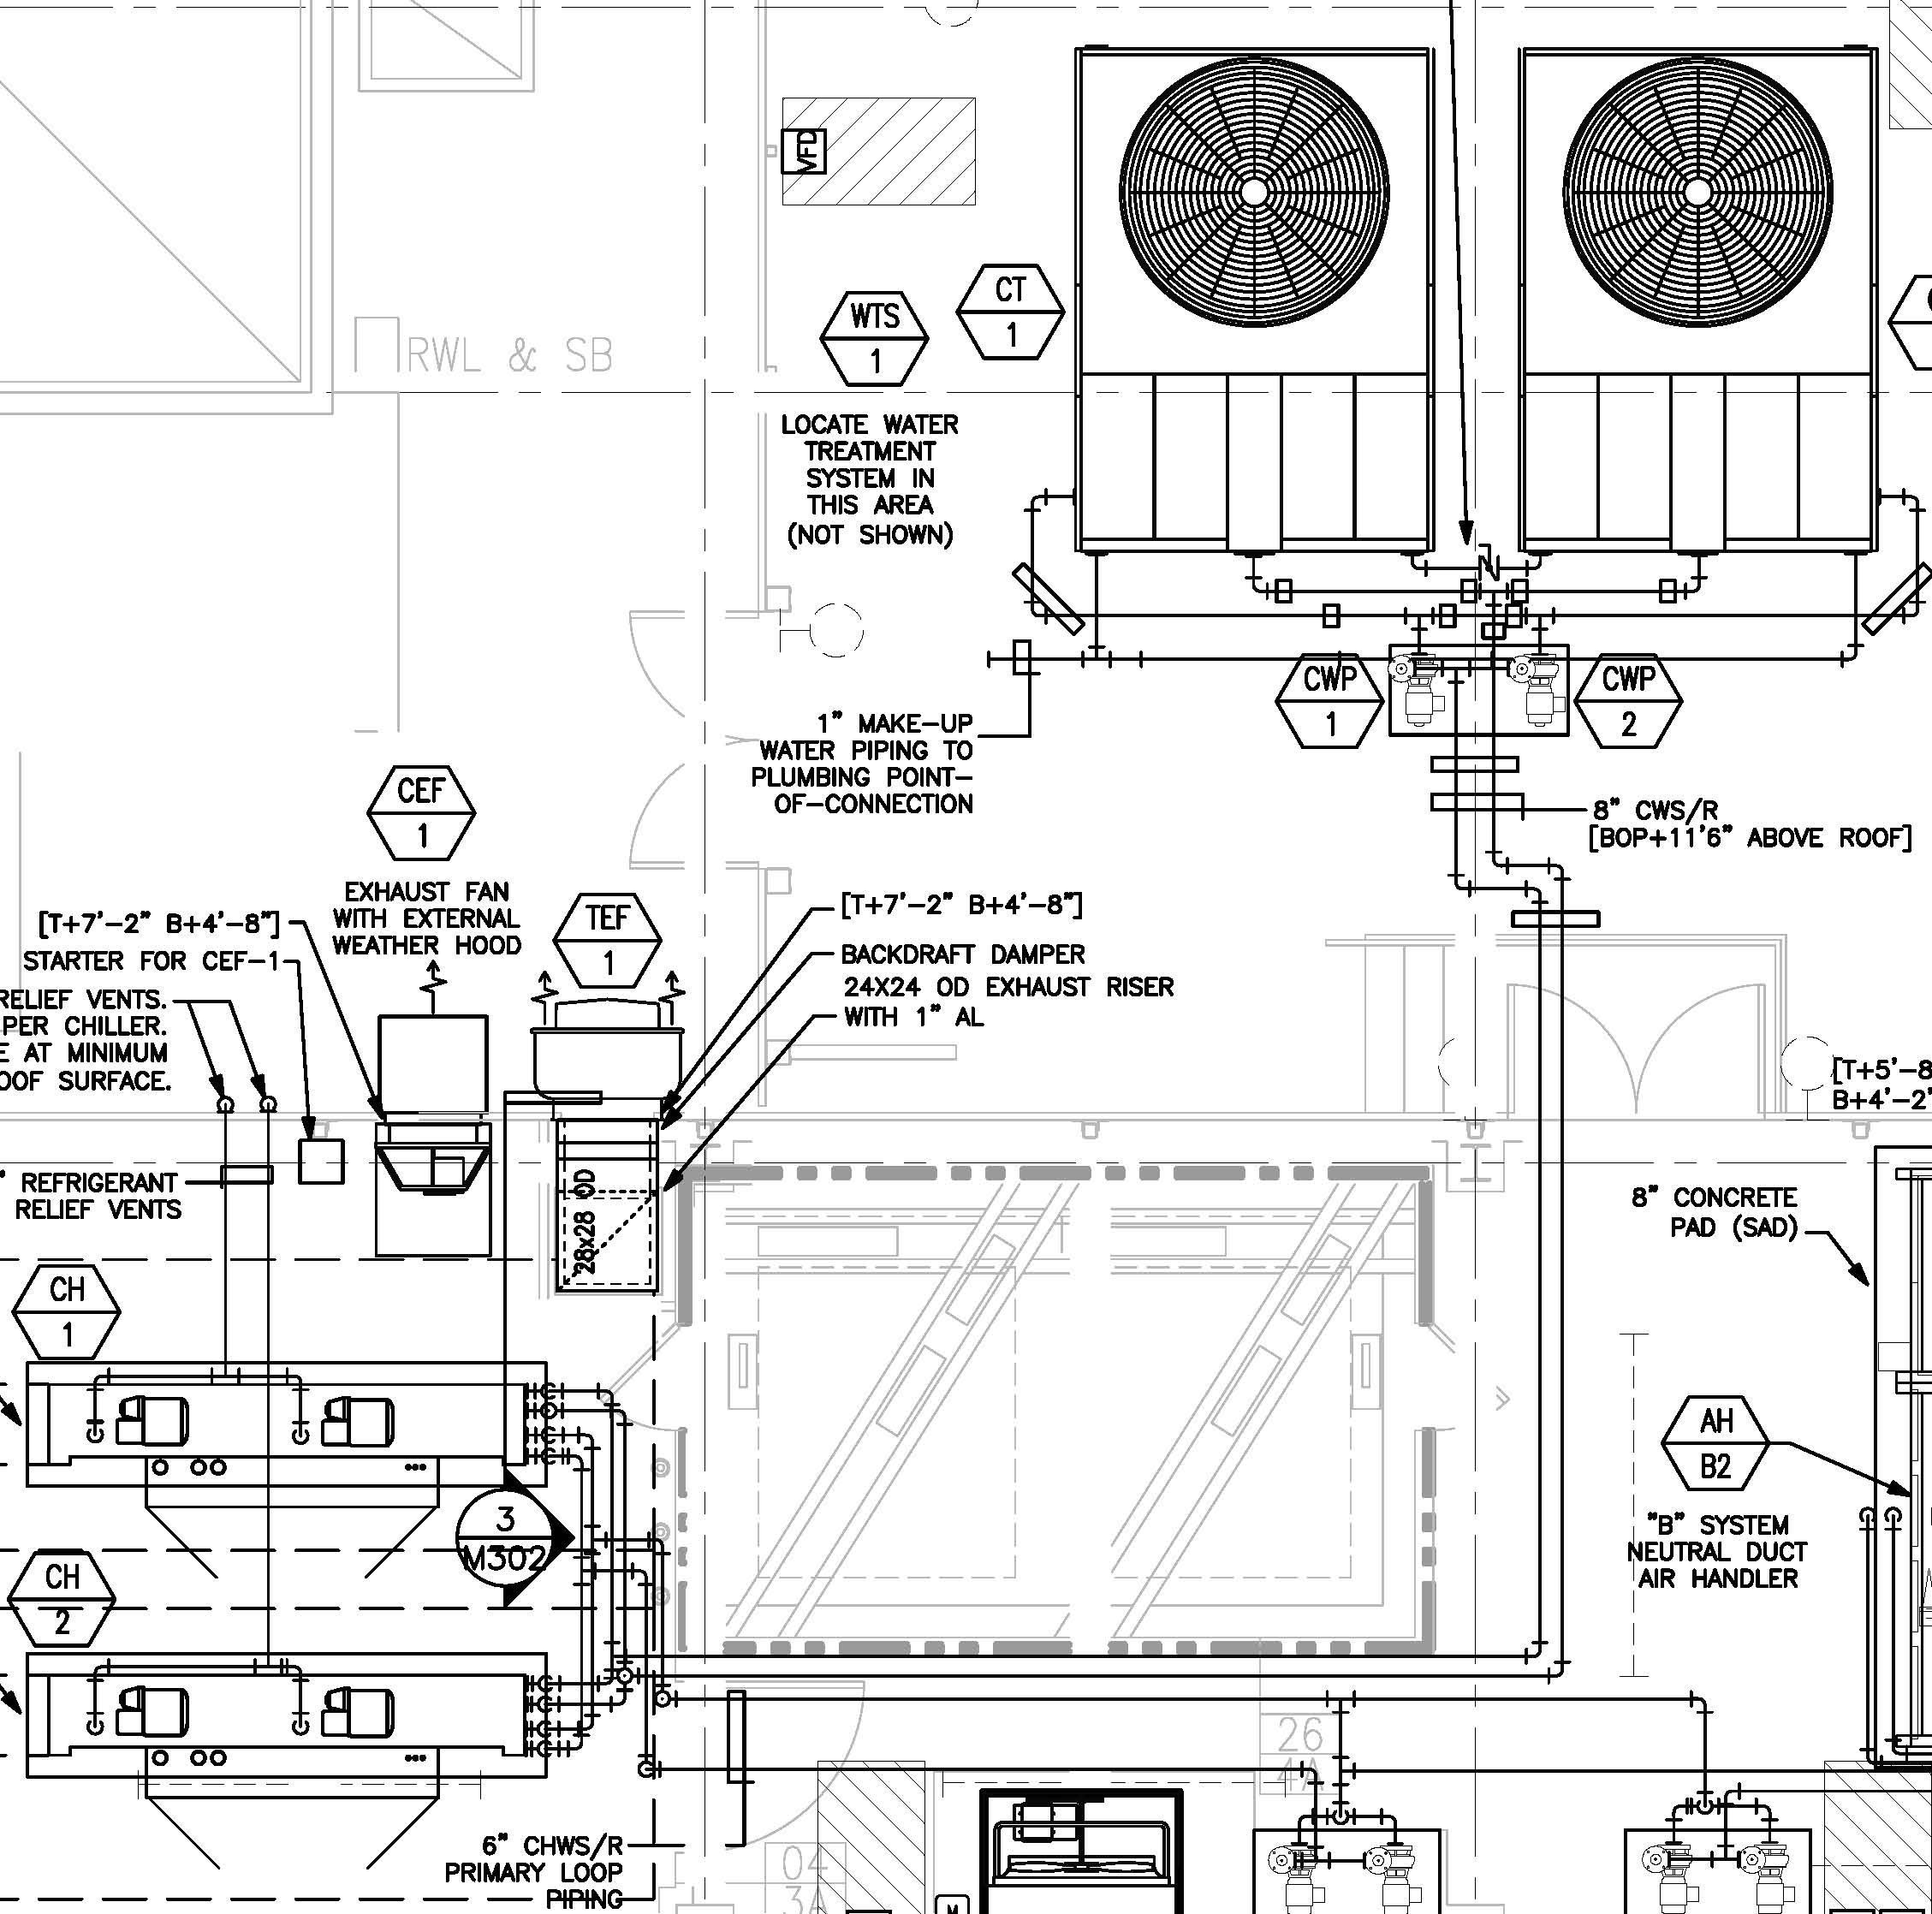 Central Air Conditioner Parts Diagram 36 Central Air Conditioner Parts Diagram Of Central Air Conditioner Parts Diagram